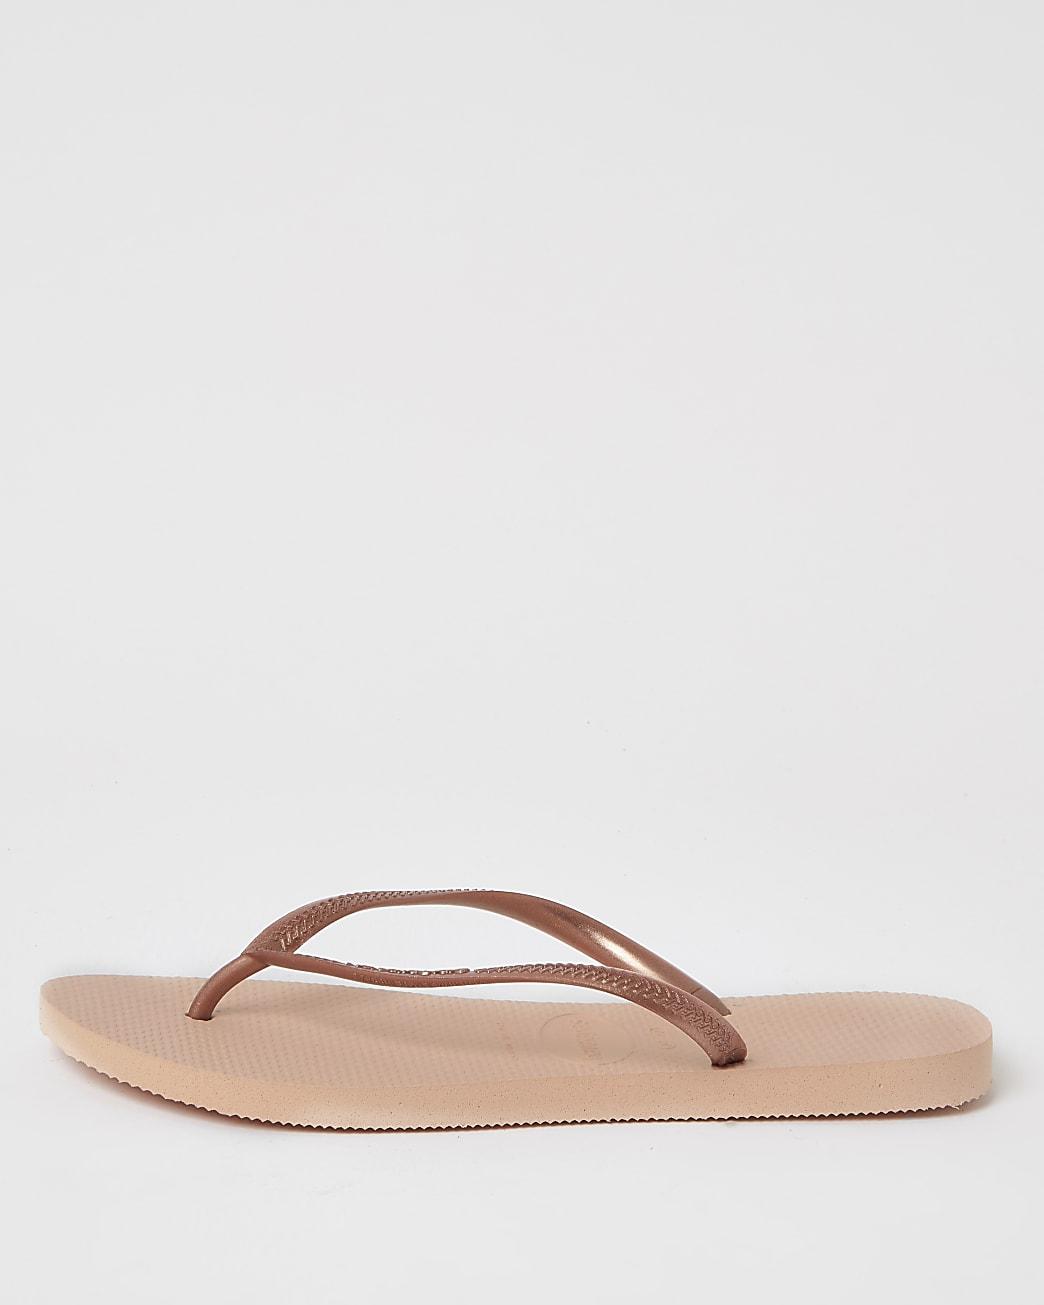 Havianas Pink slim flip flops